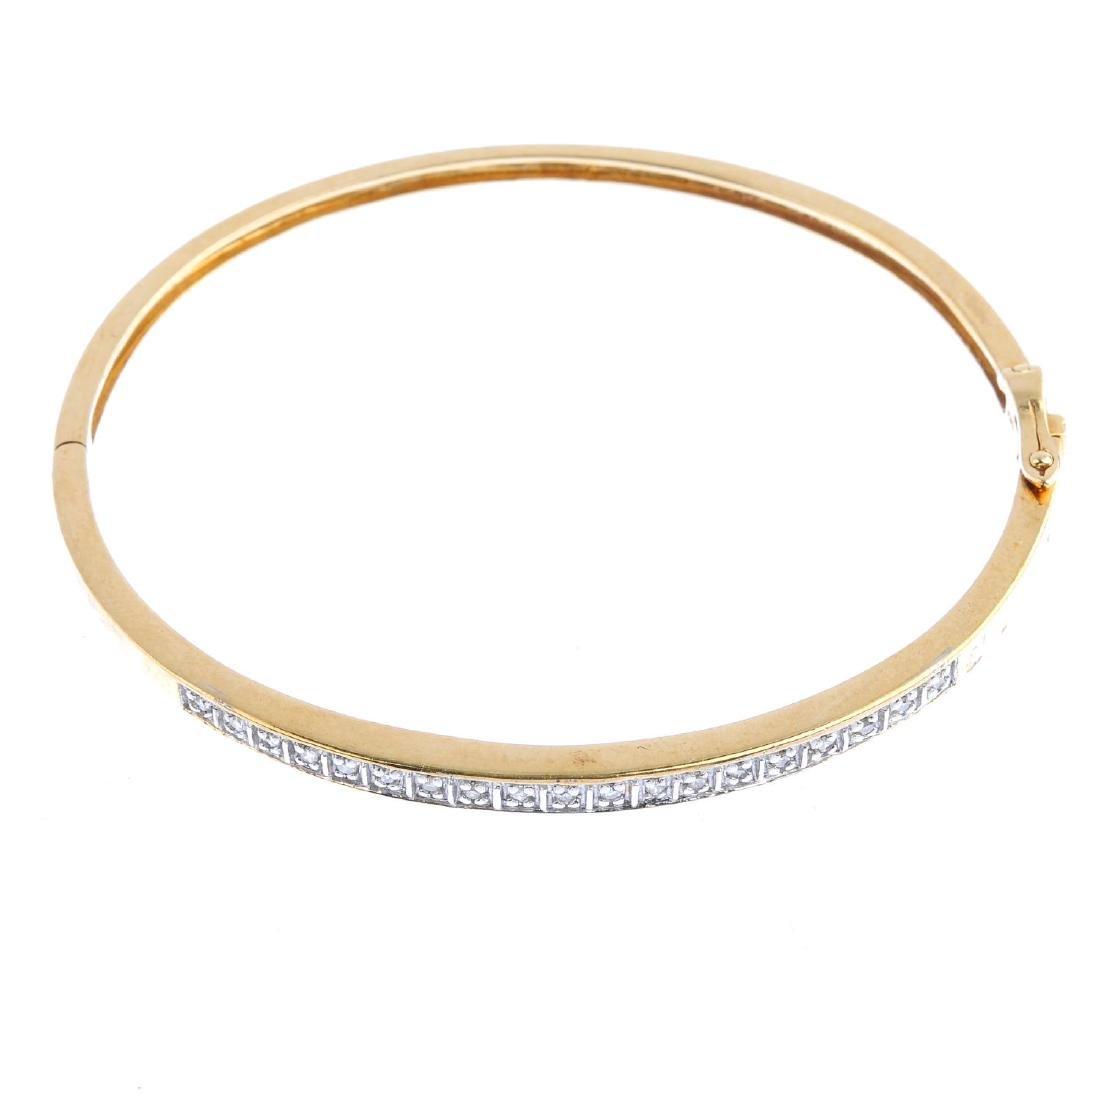 A 9ct gold diamond hinged bangle. The single-cut